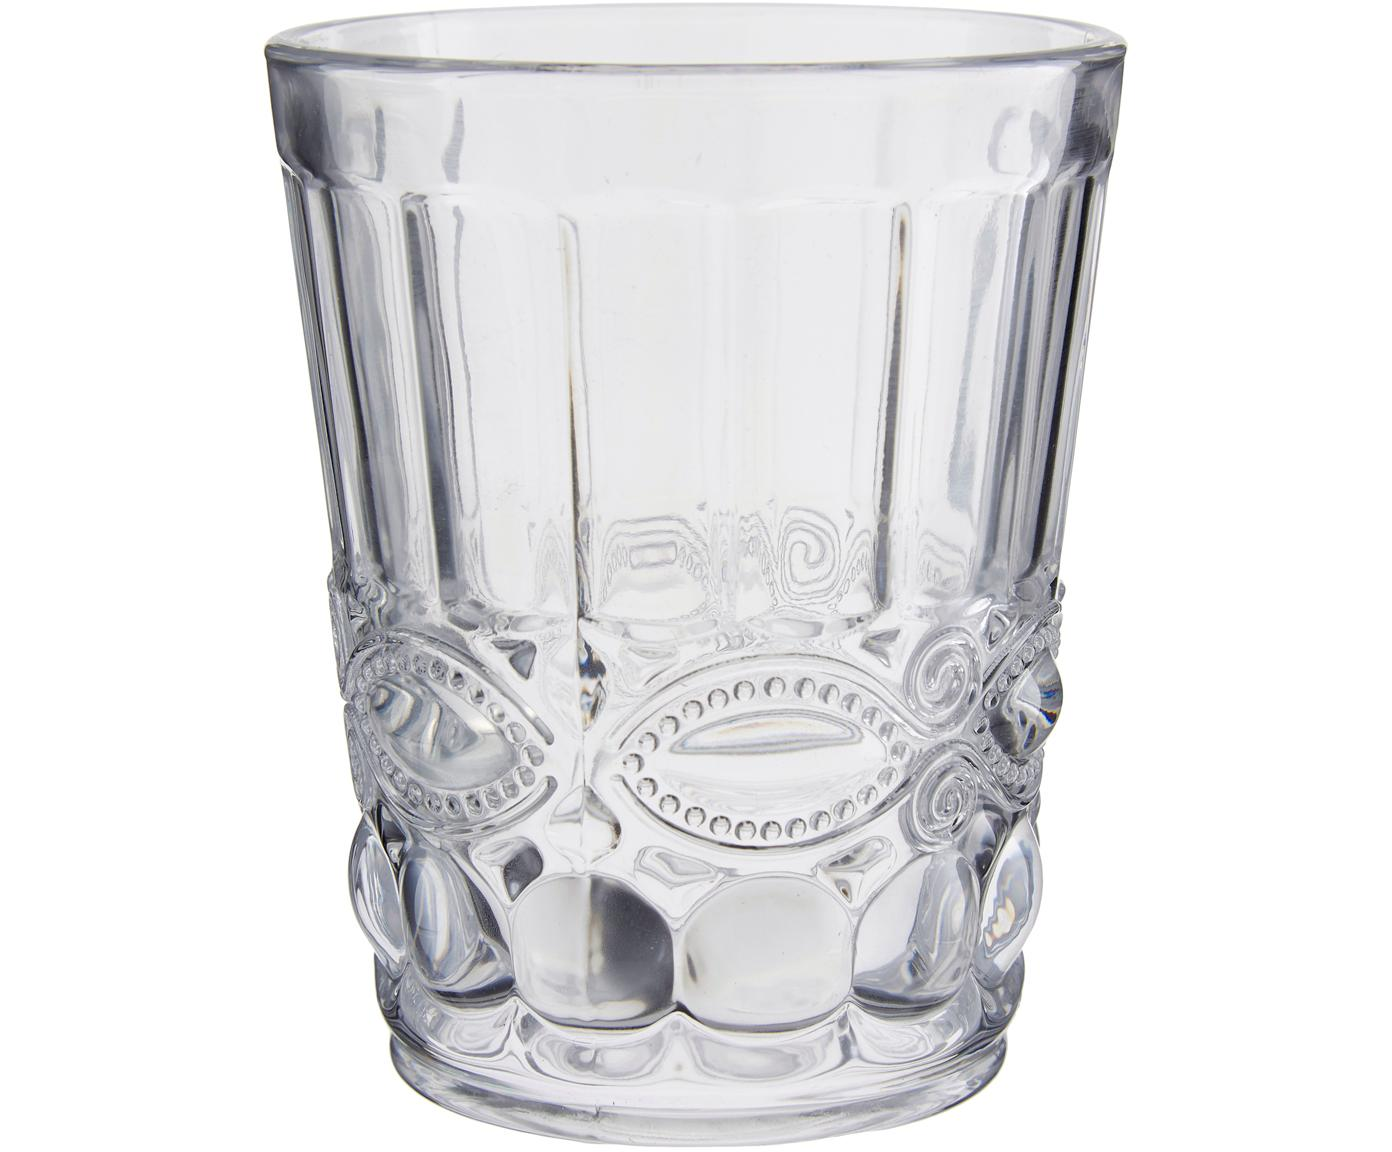 Bicchiere acqua con rilievo Nobilis 6 pz, Vetro, Trasparente, Ø 9 x Alt. 11 cm